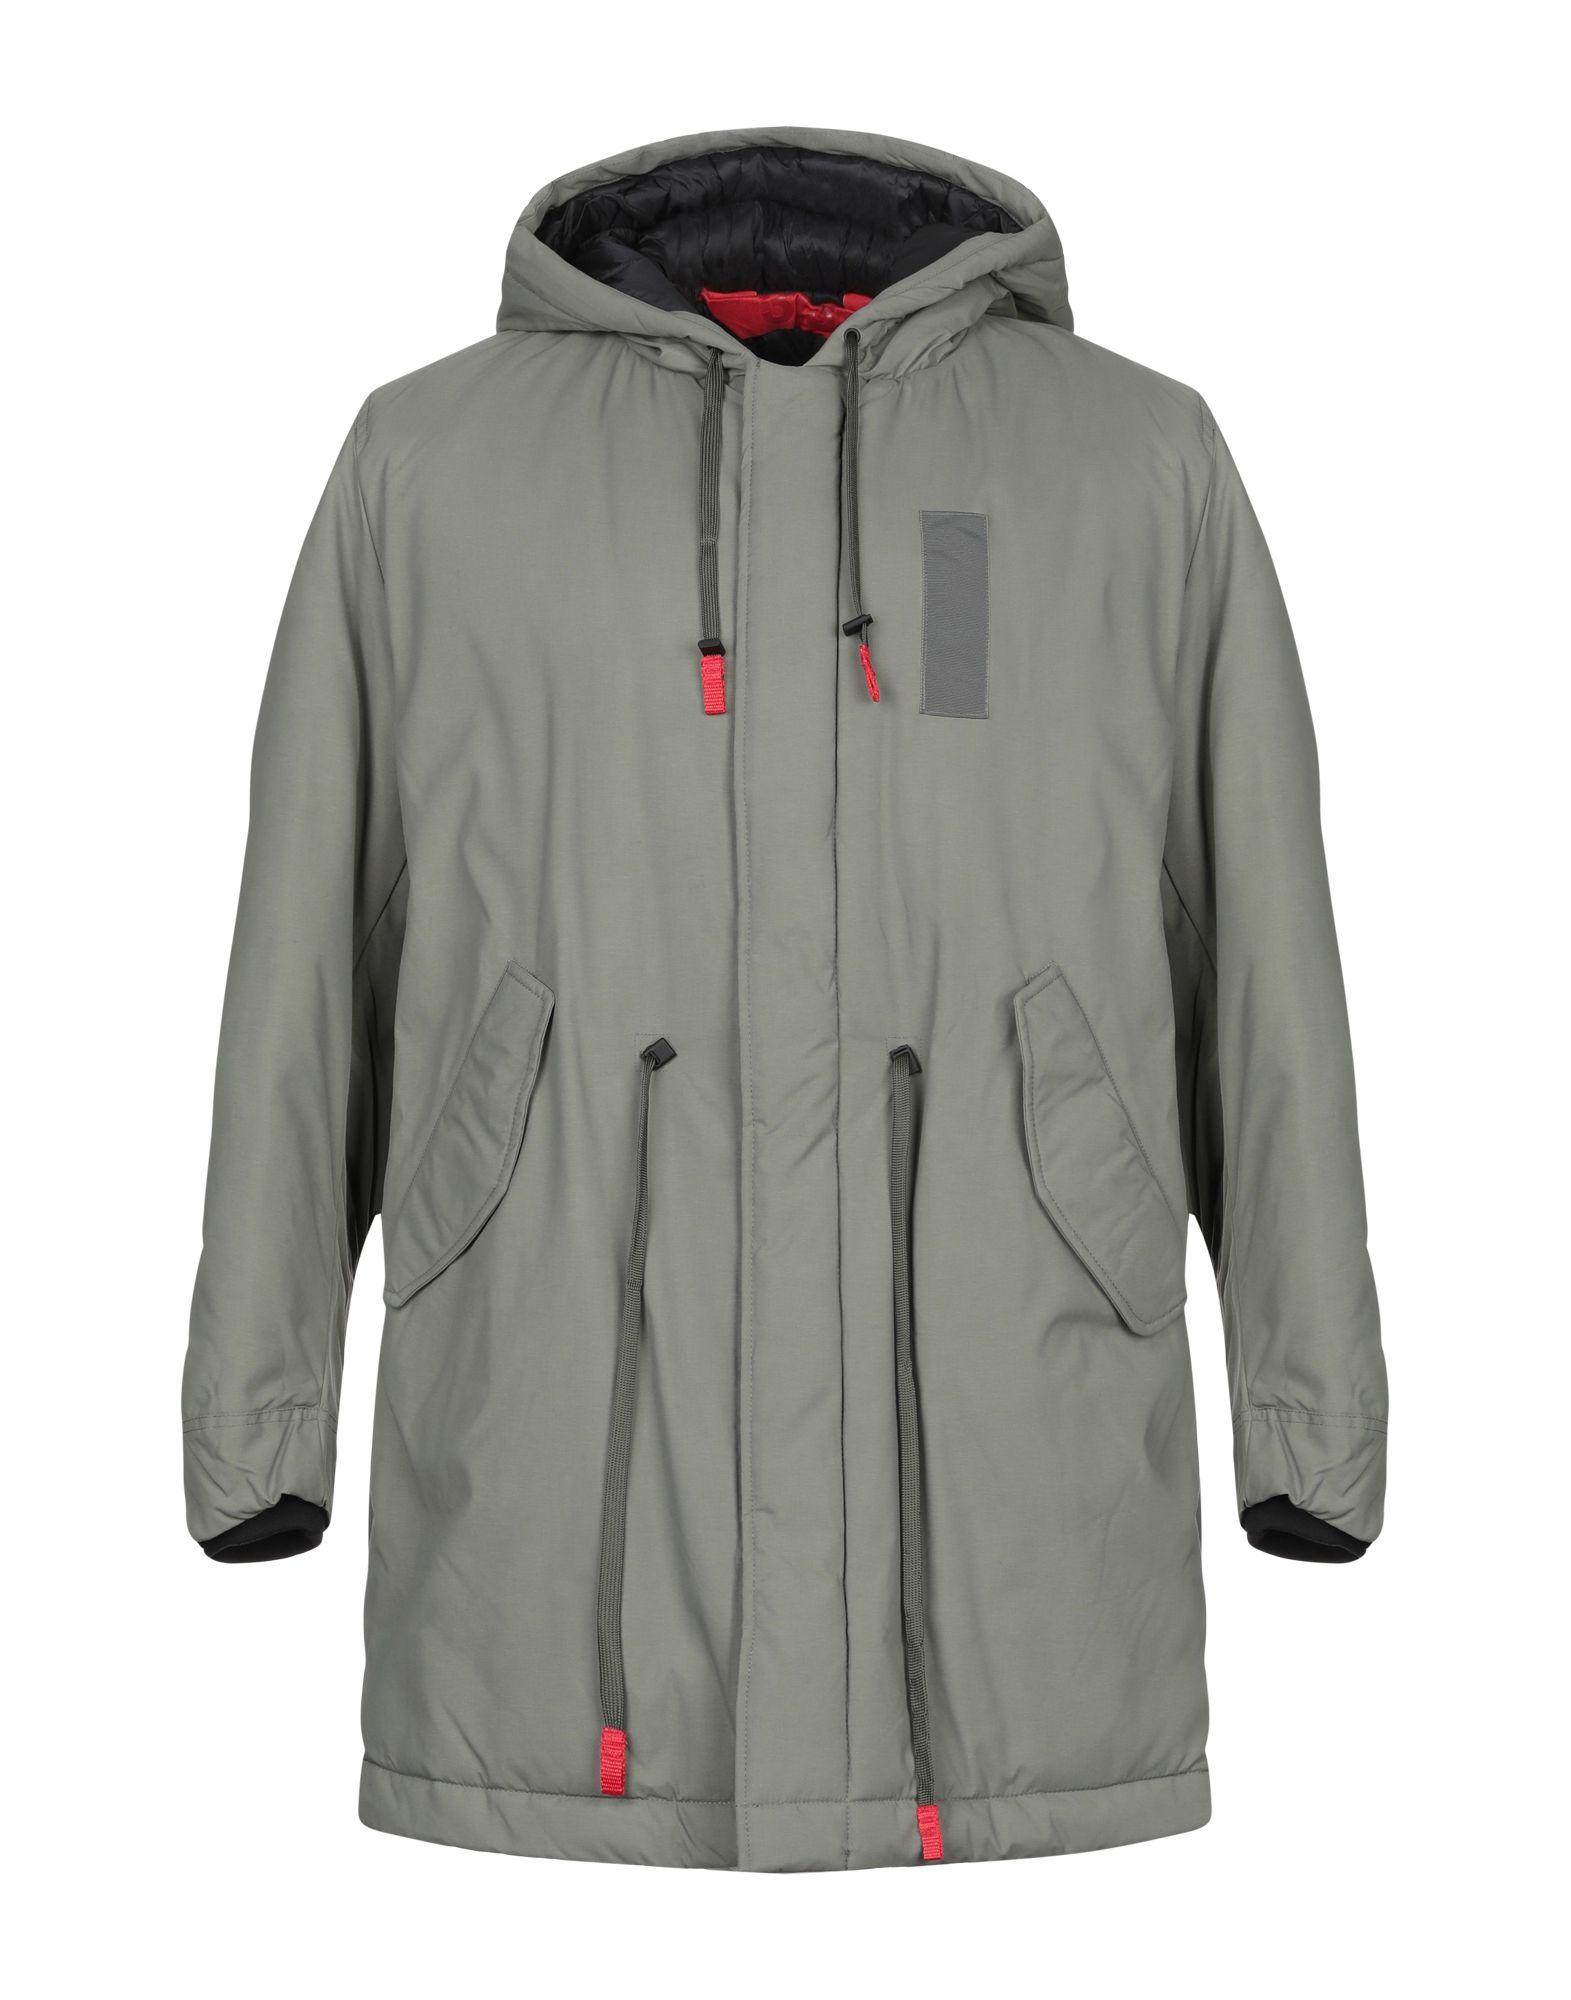 313 TRE UNO TRE Пальто 313 tre uno tre пальто